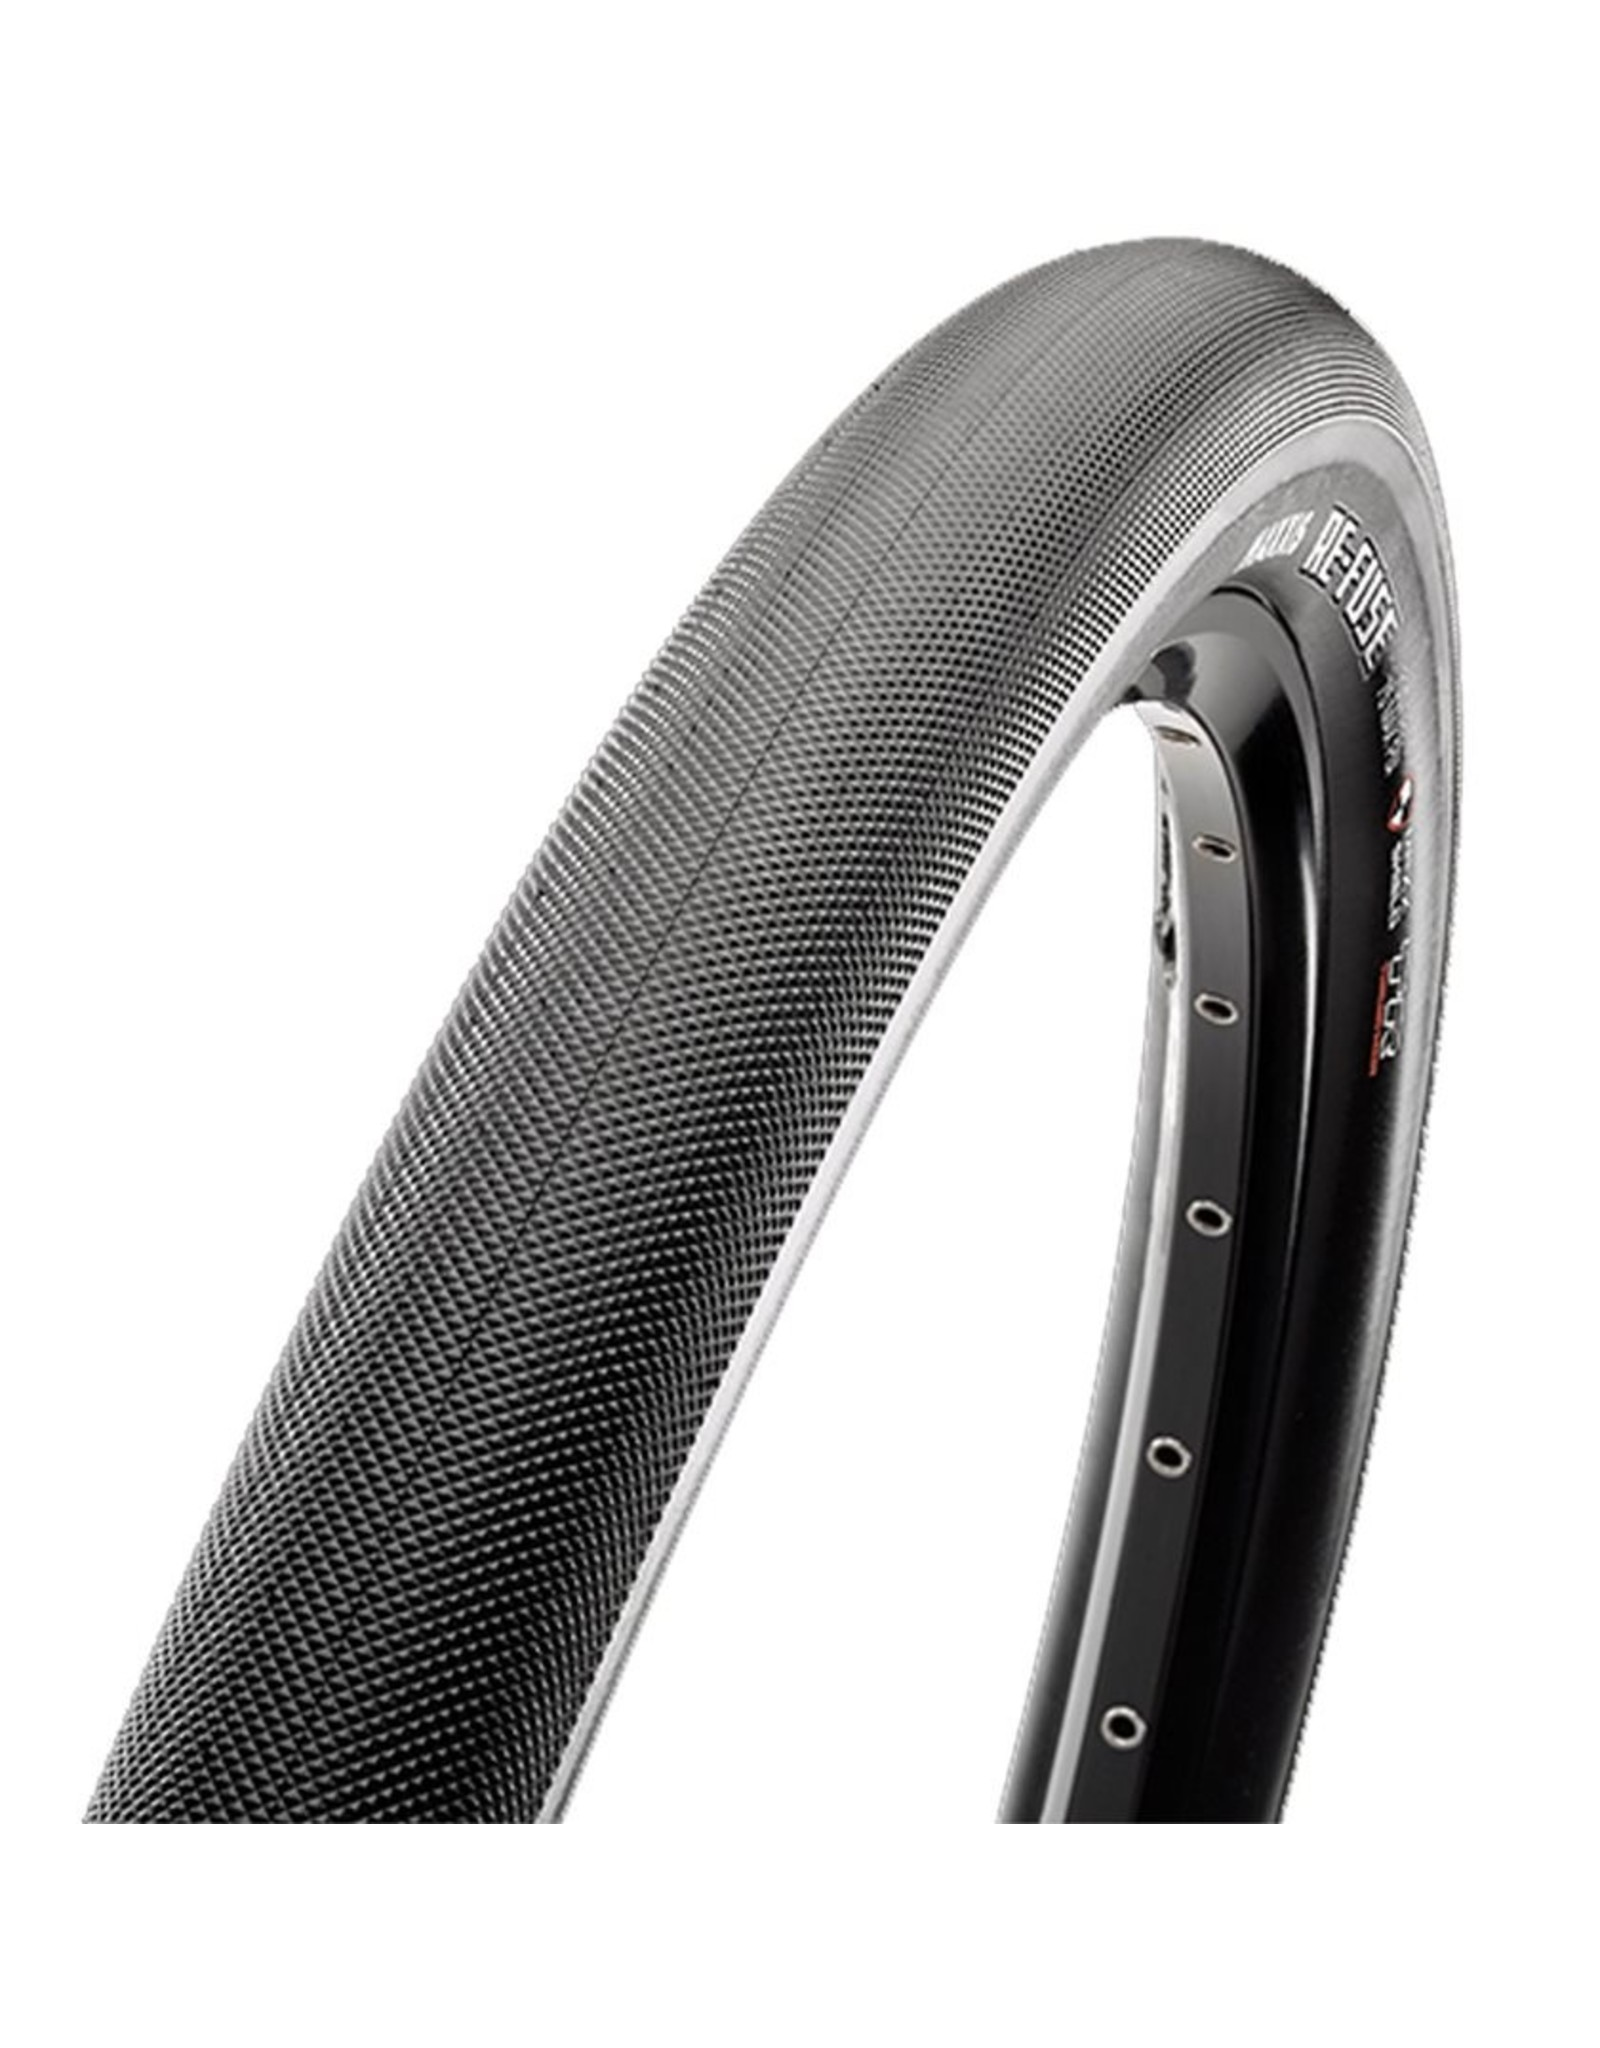 Maxxis Maxxis Re-Fuse Tire, 700 x 40 TR - Black